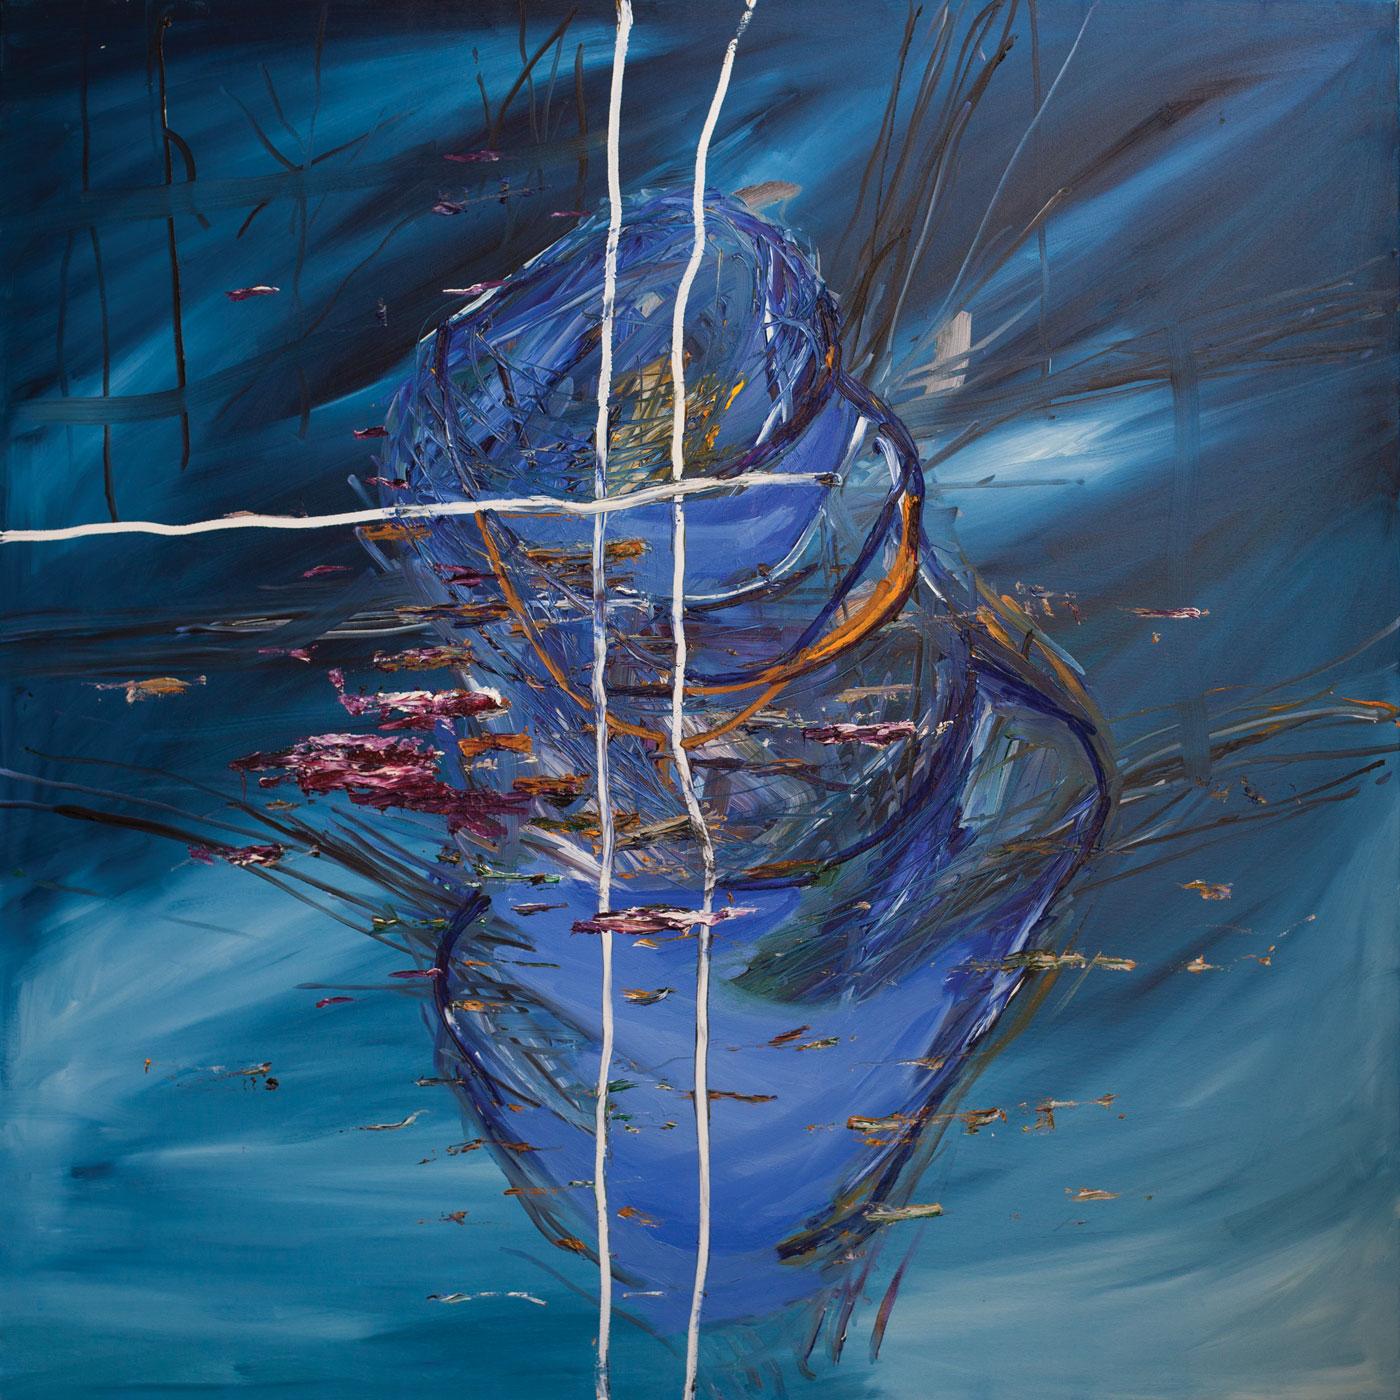 418 Gallery Petrica Stefan WATER CLOUD 1, ulei pe panza, 180x150cm, 2015